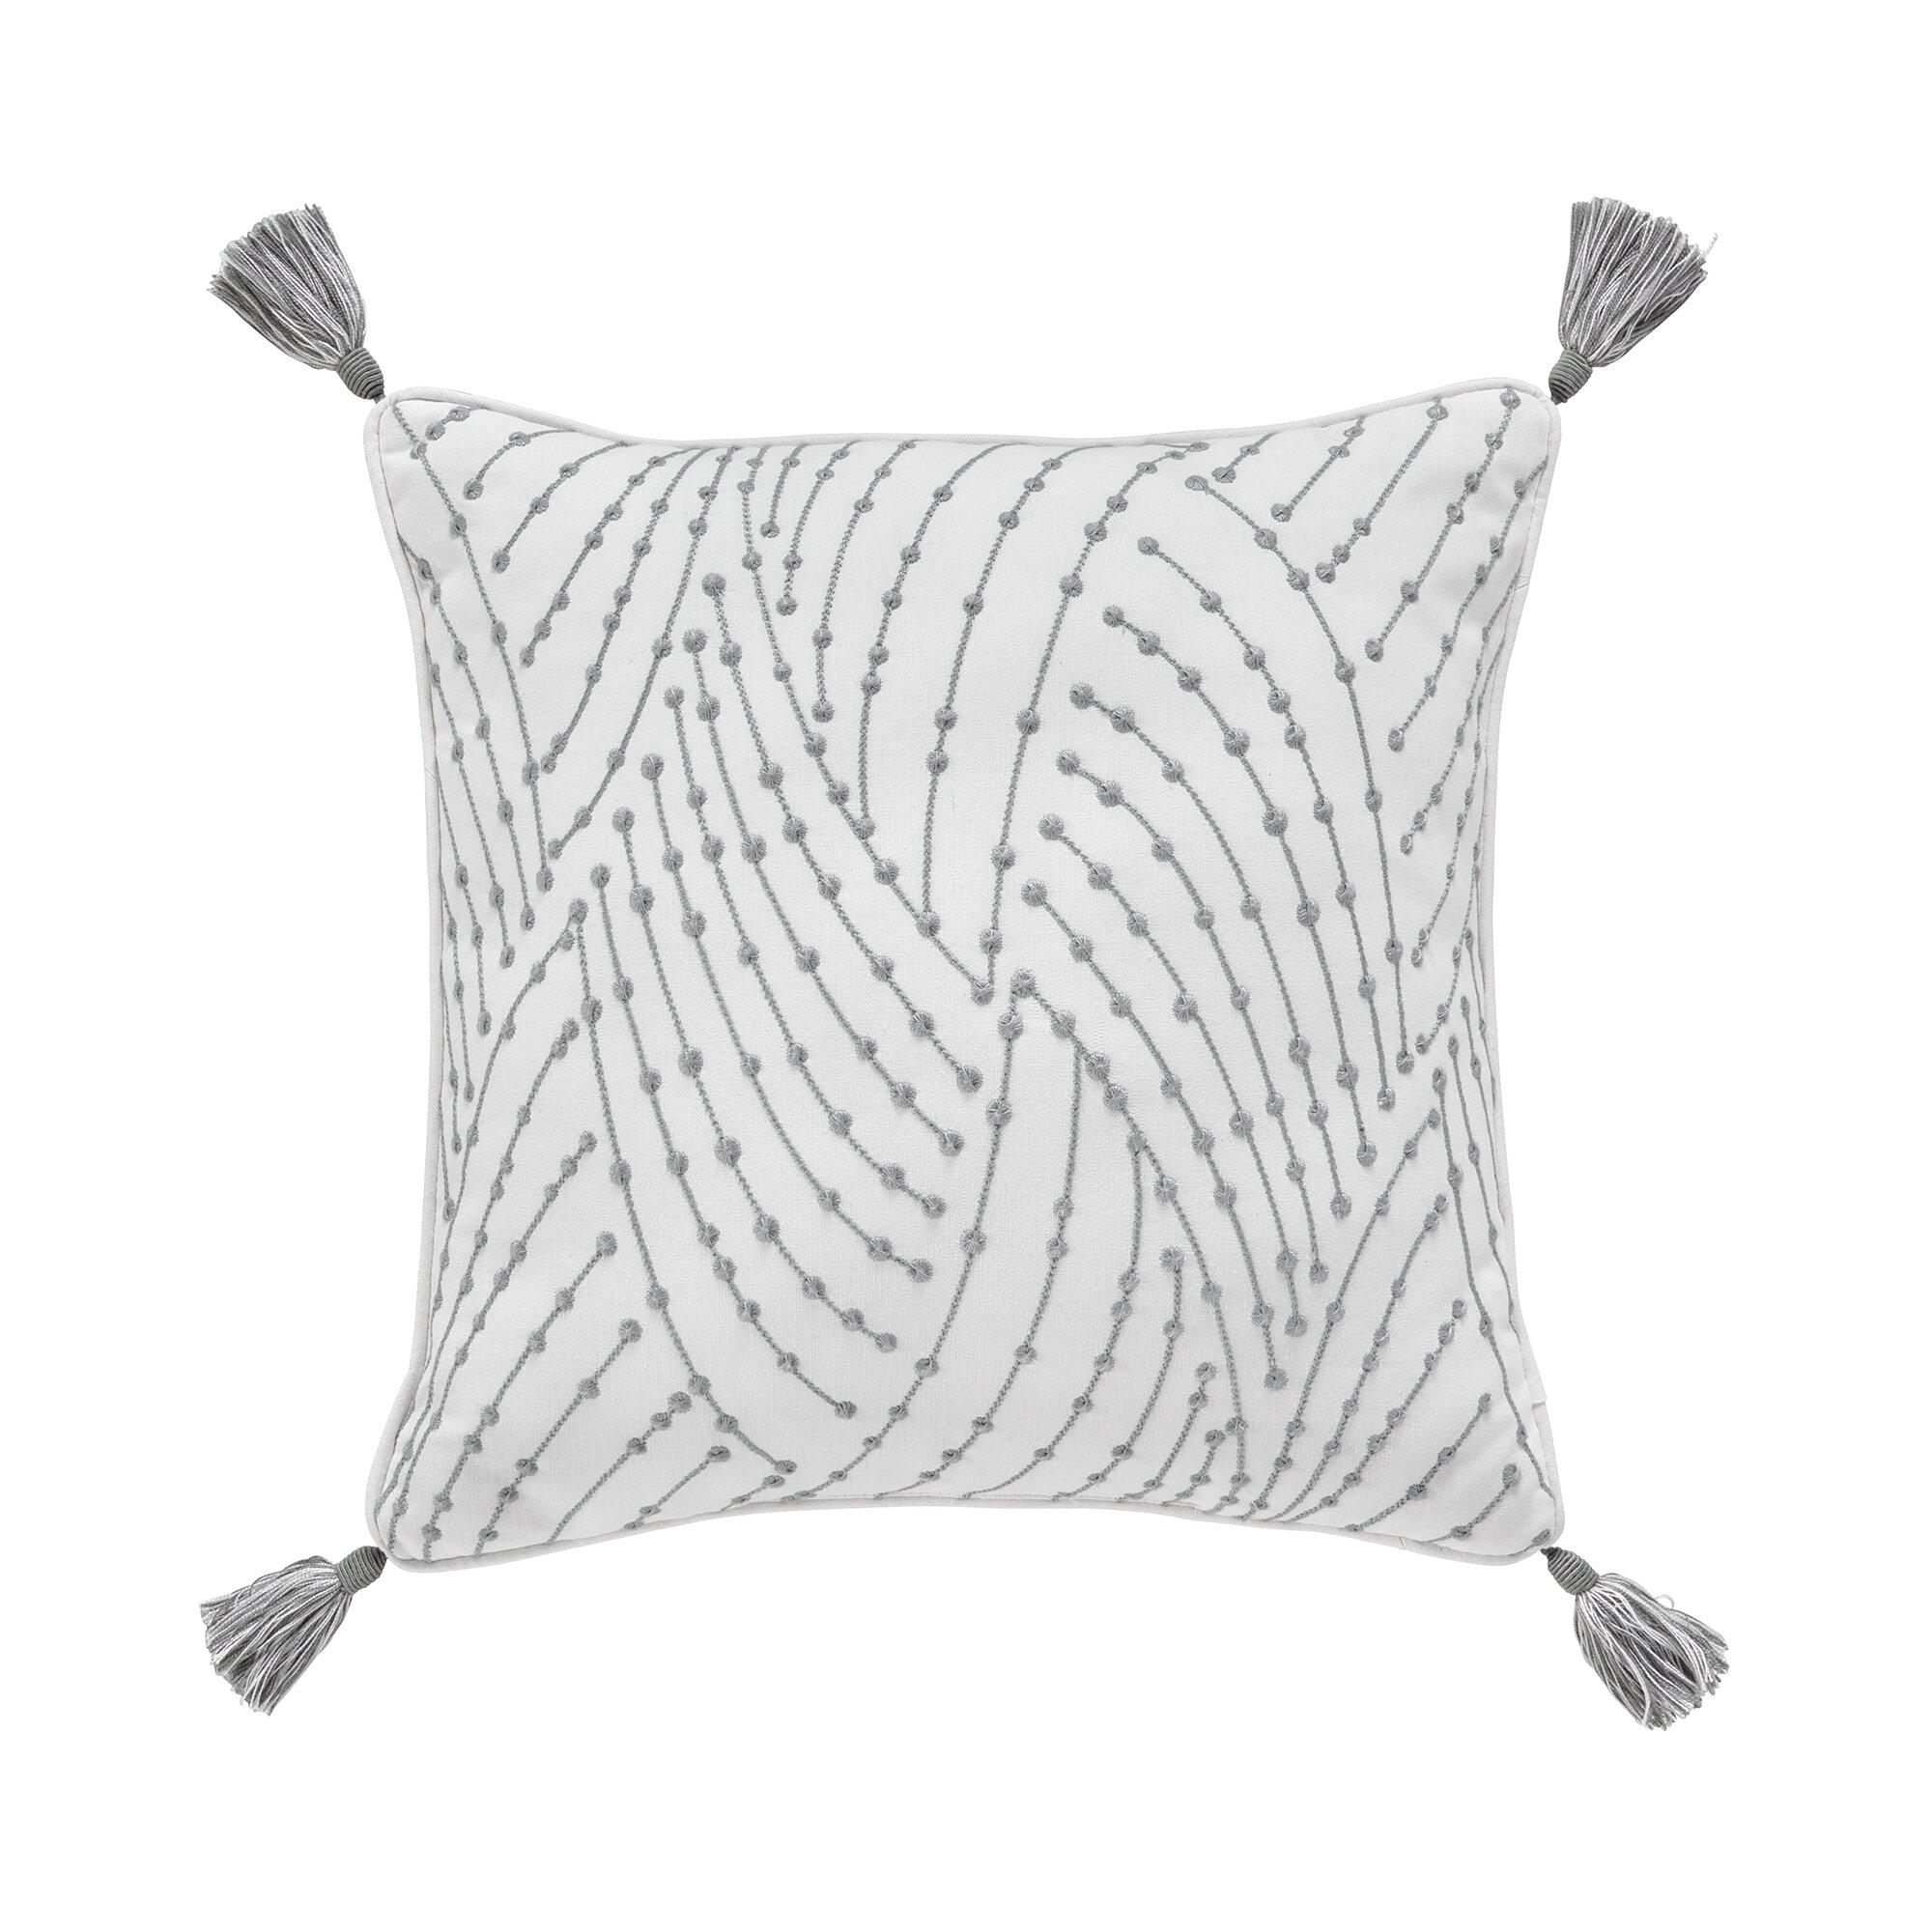 Croscill Eleyana 100% Cotton Throw Pillow | Wayfair - Croscill Home Fashions Eleyana 100% Cotton Throw Pillow